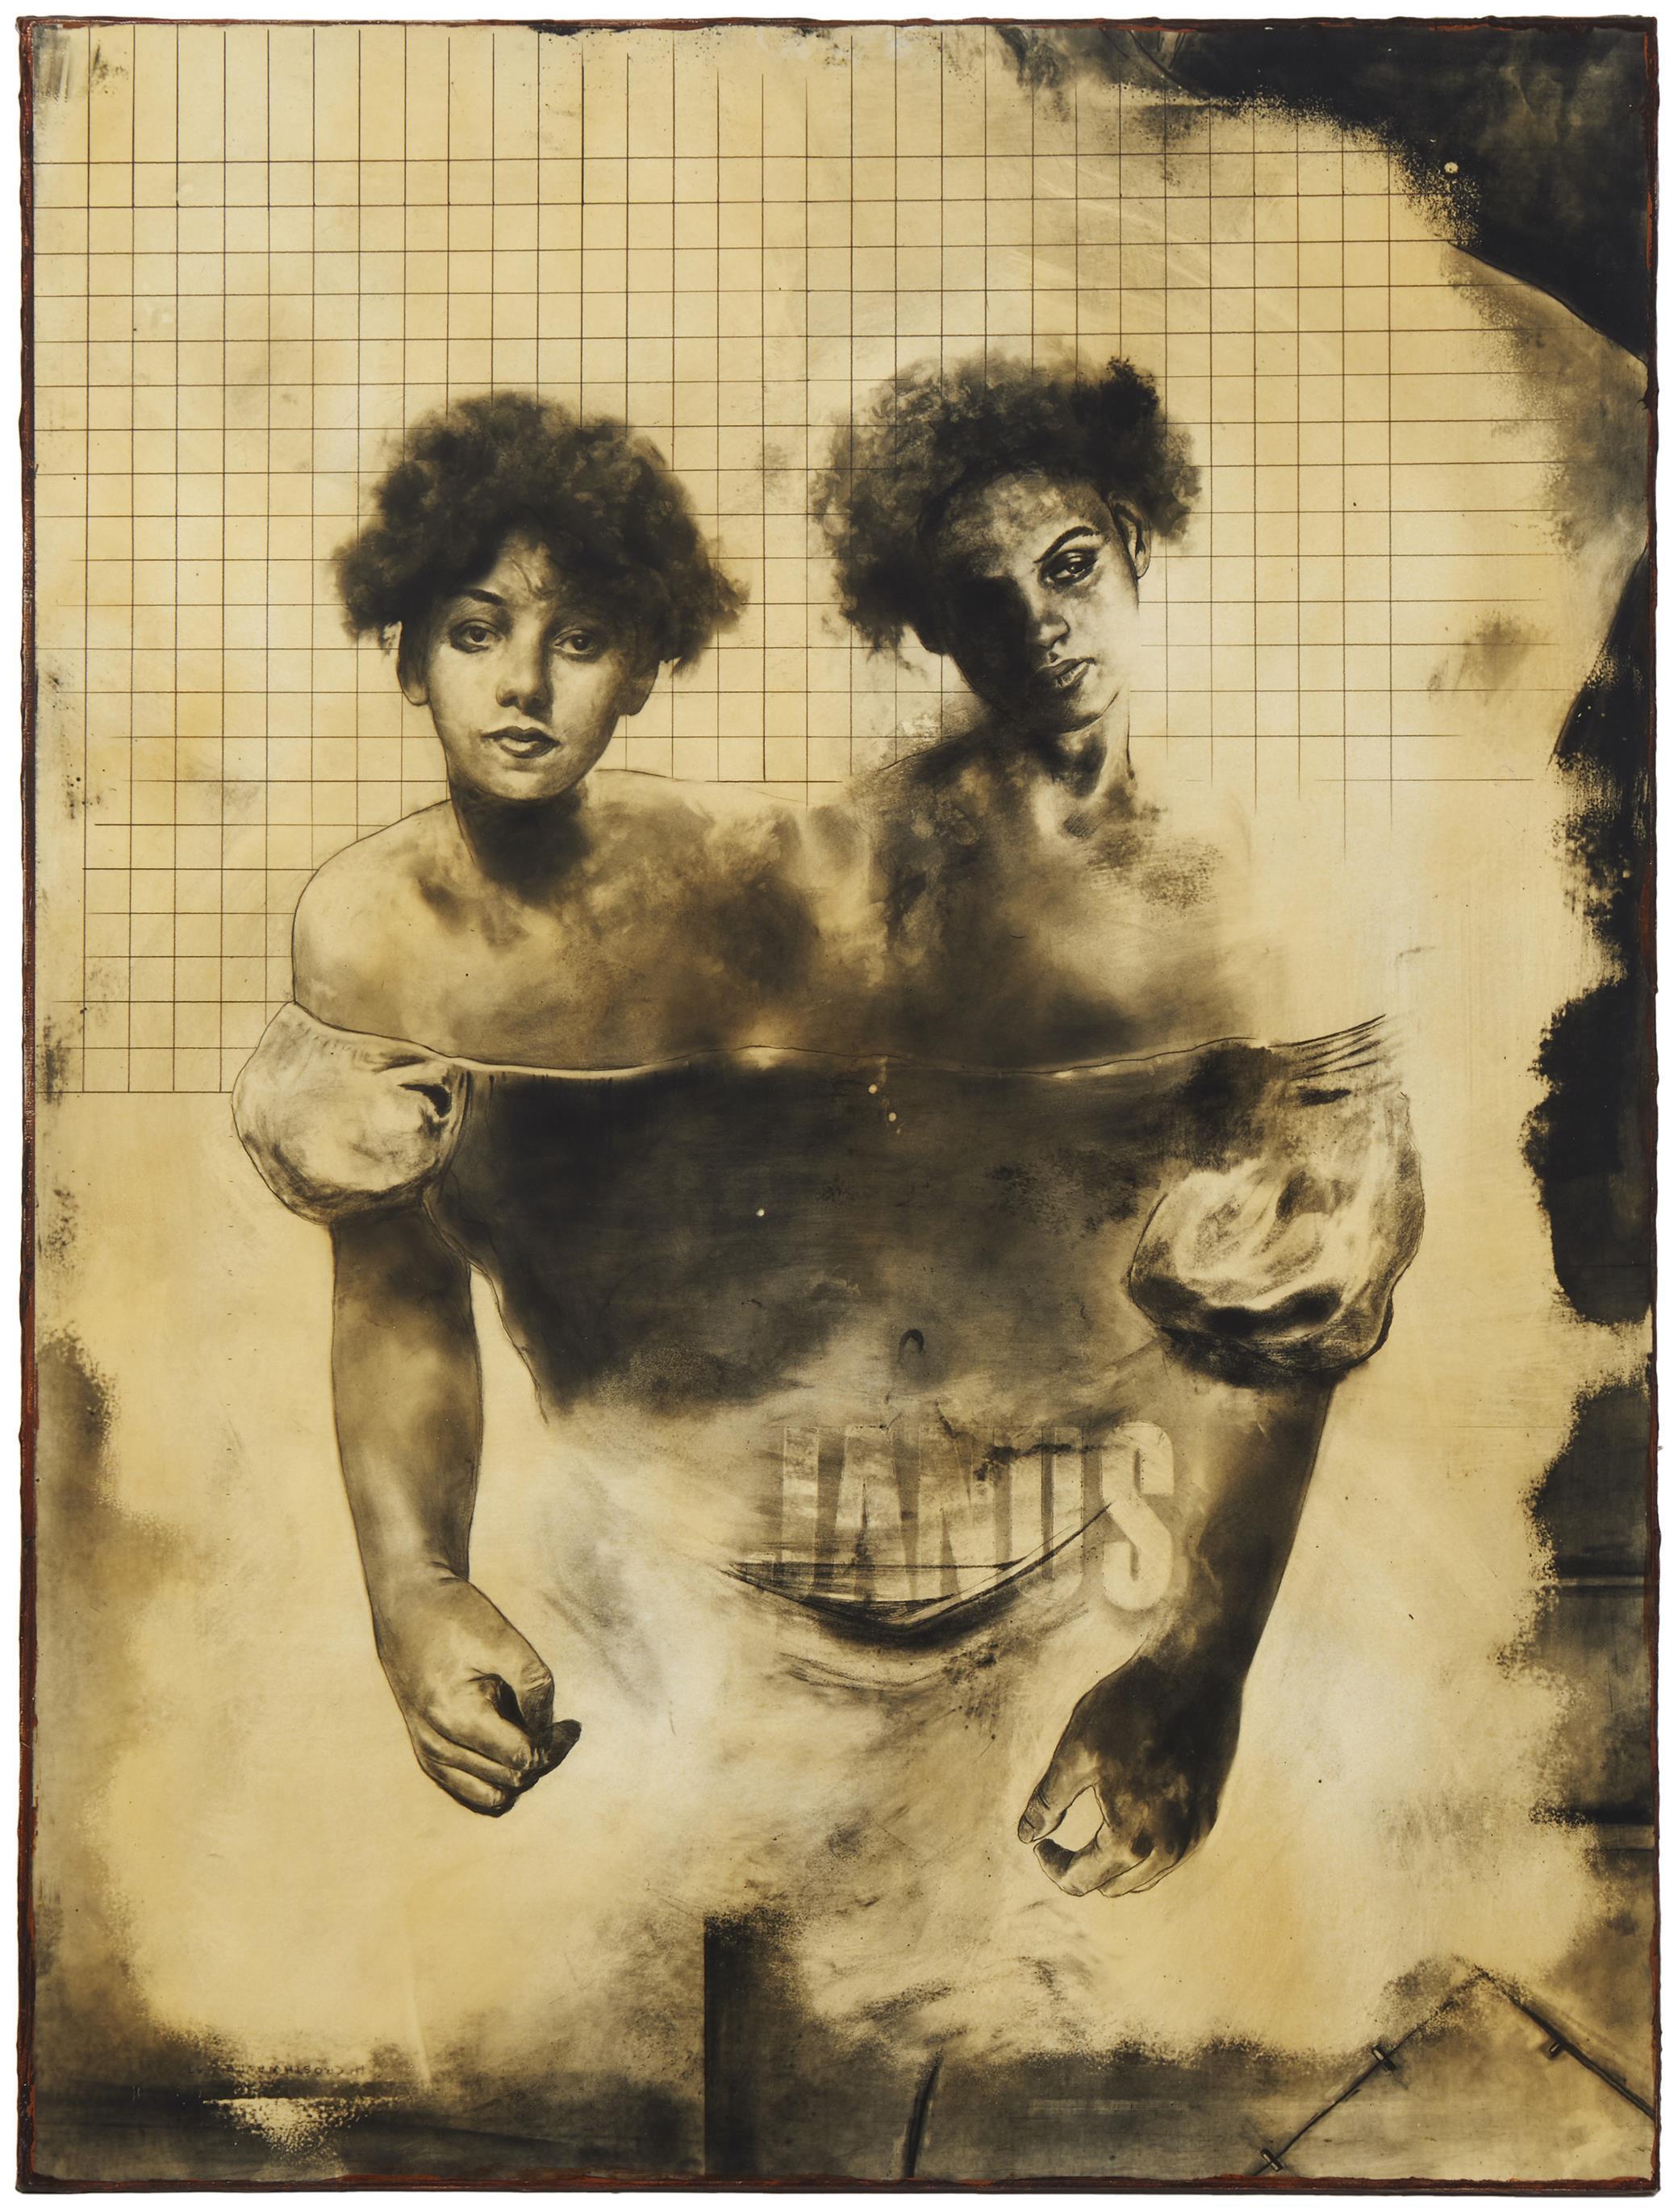 "Hugo Crosthwaite, (b. 1971, Mexican/American), ""Janus,"" 1997, Graphite on Mylar mounted on wood panel, 24.5"" H x 18.25"" W"